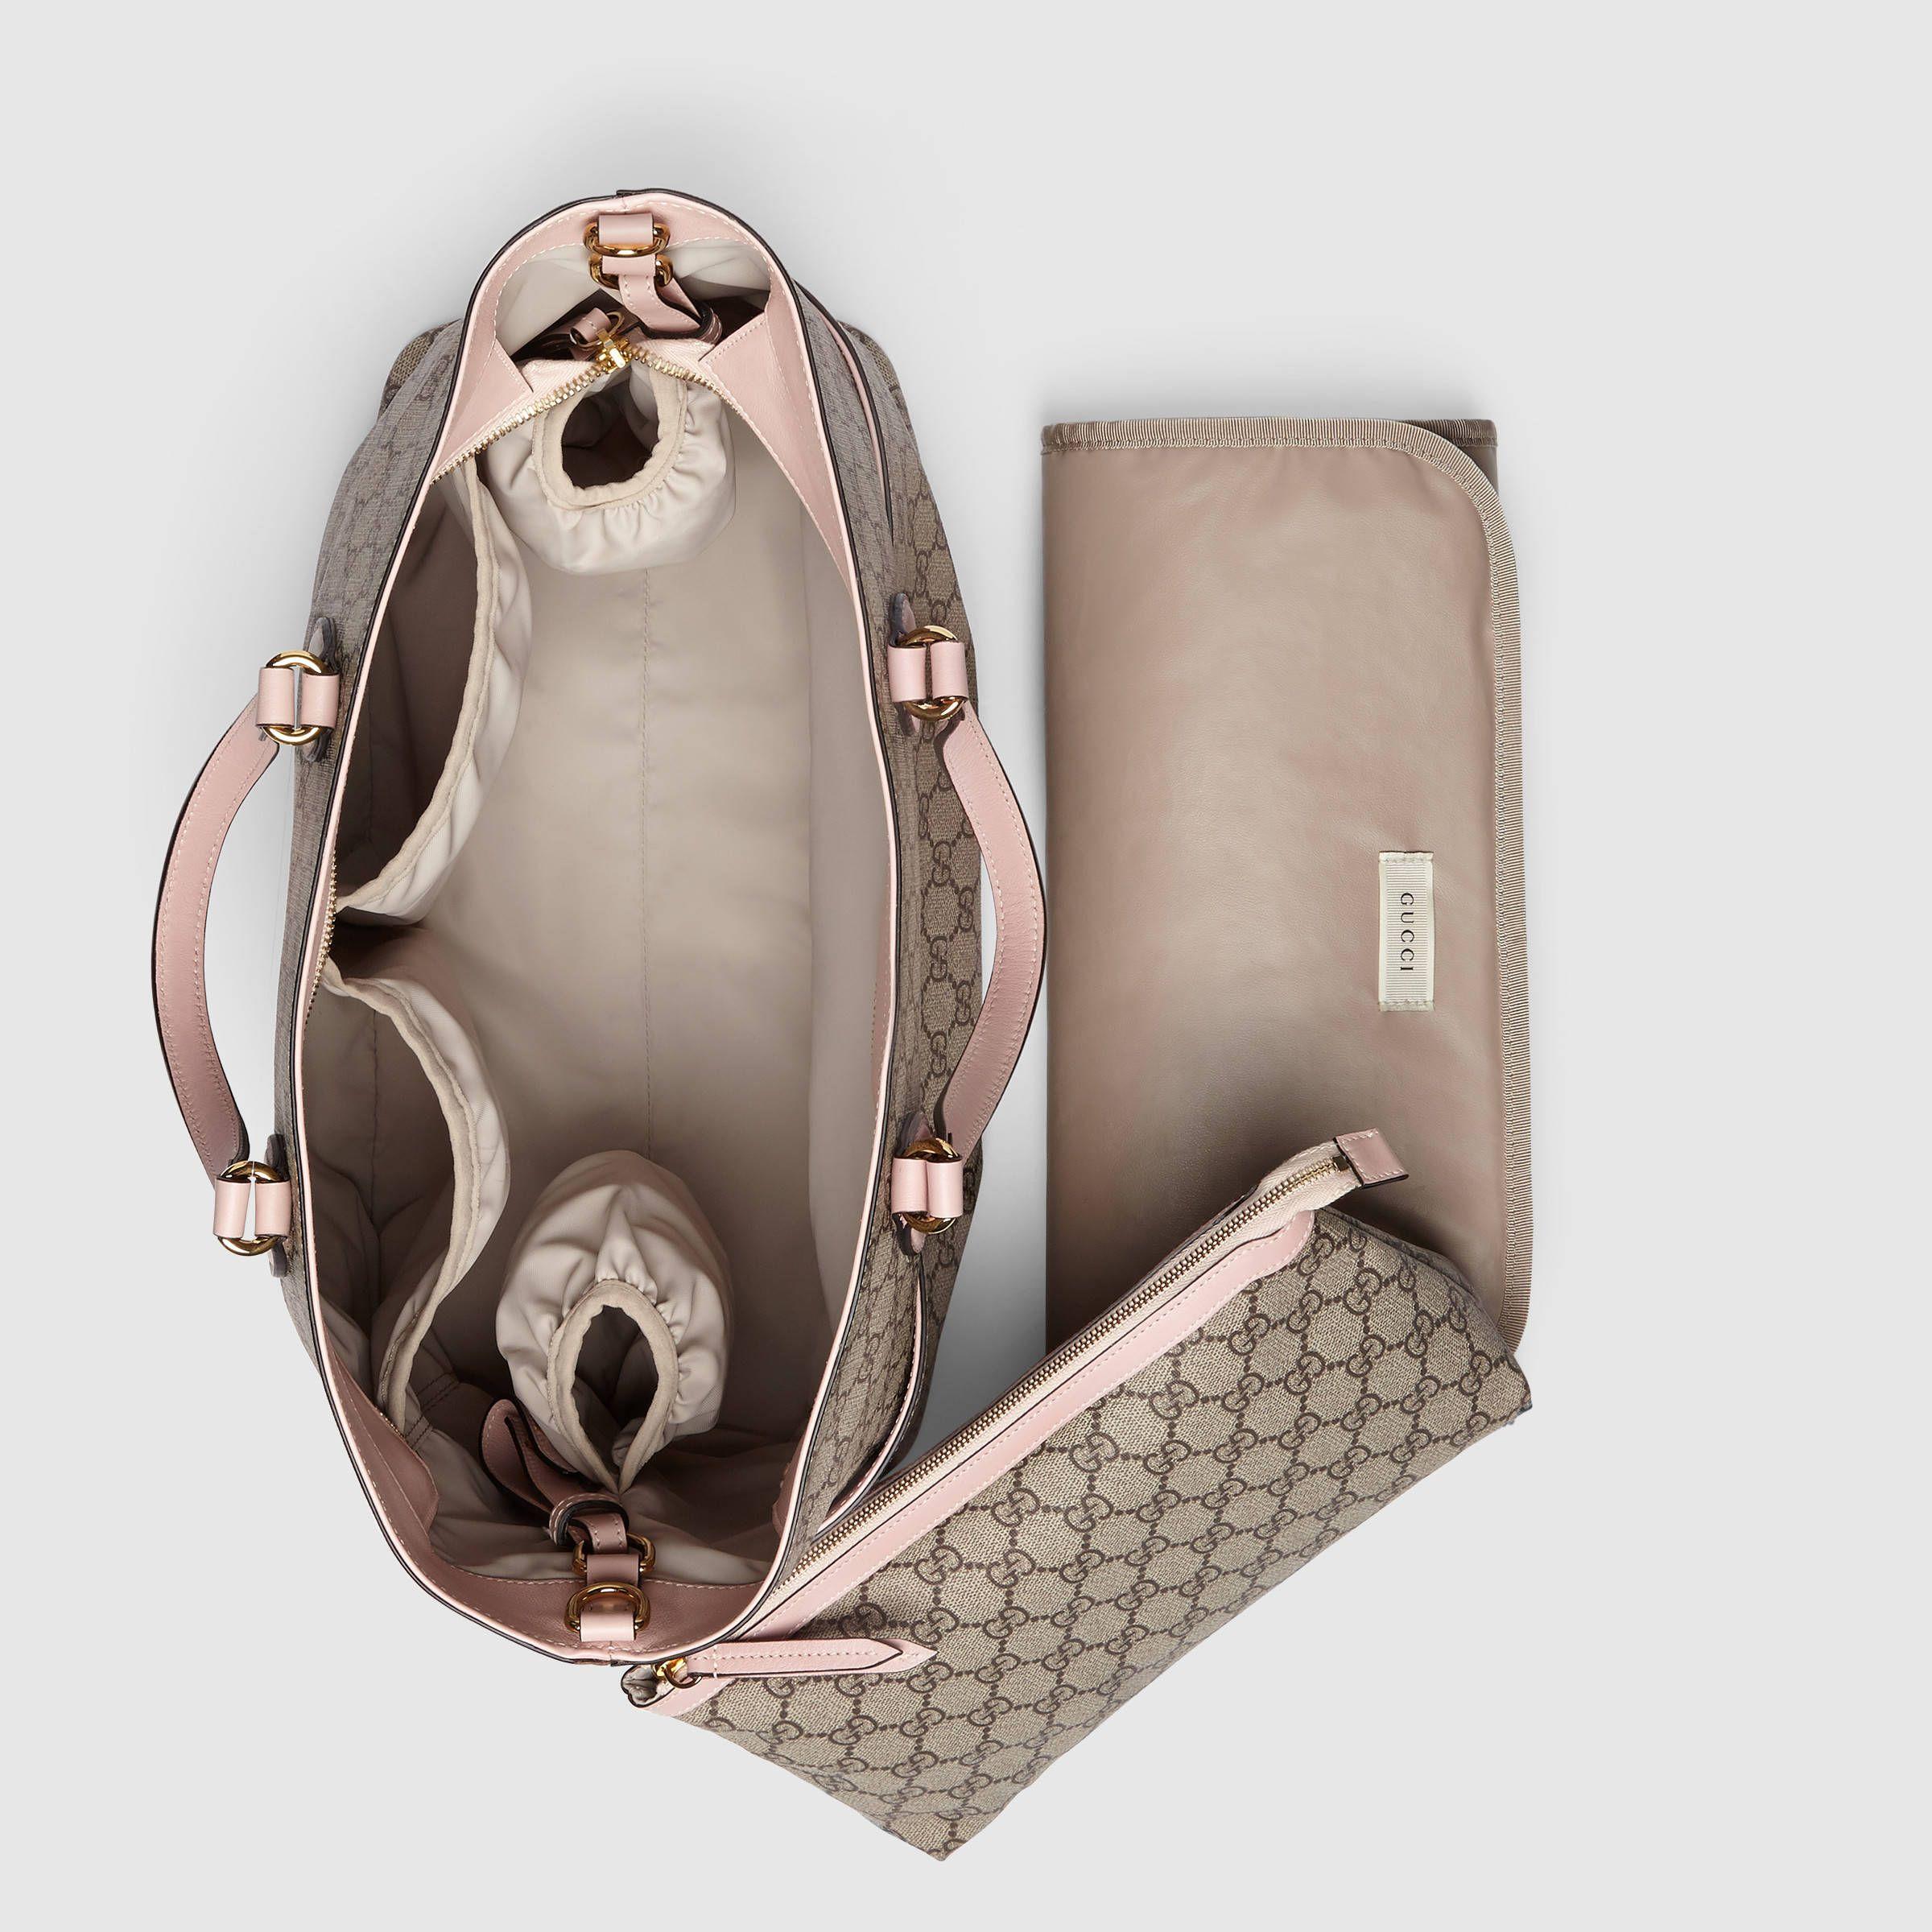 31a746be9db5 Soft GG Supreme diaper bag - Gucci Diaper Bags & Totes 457356K5ICG8268